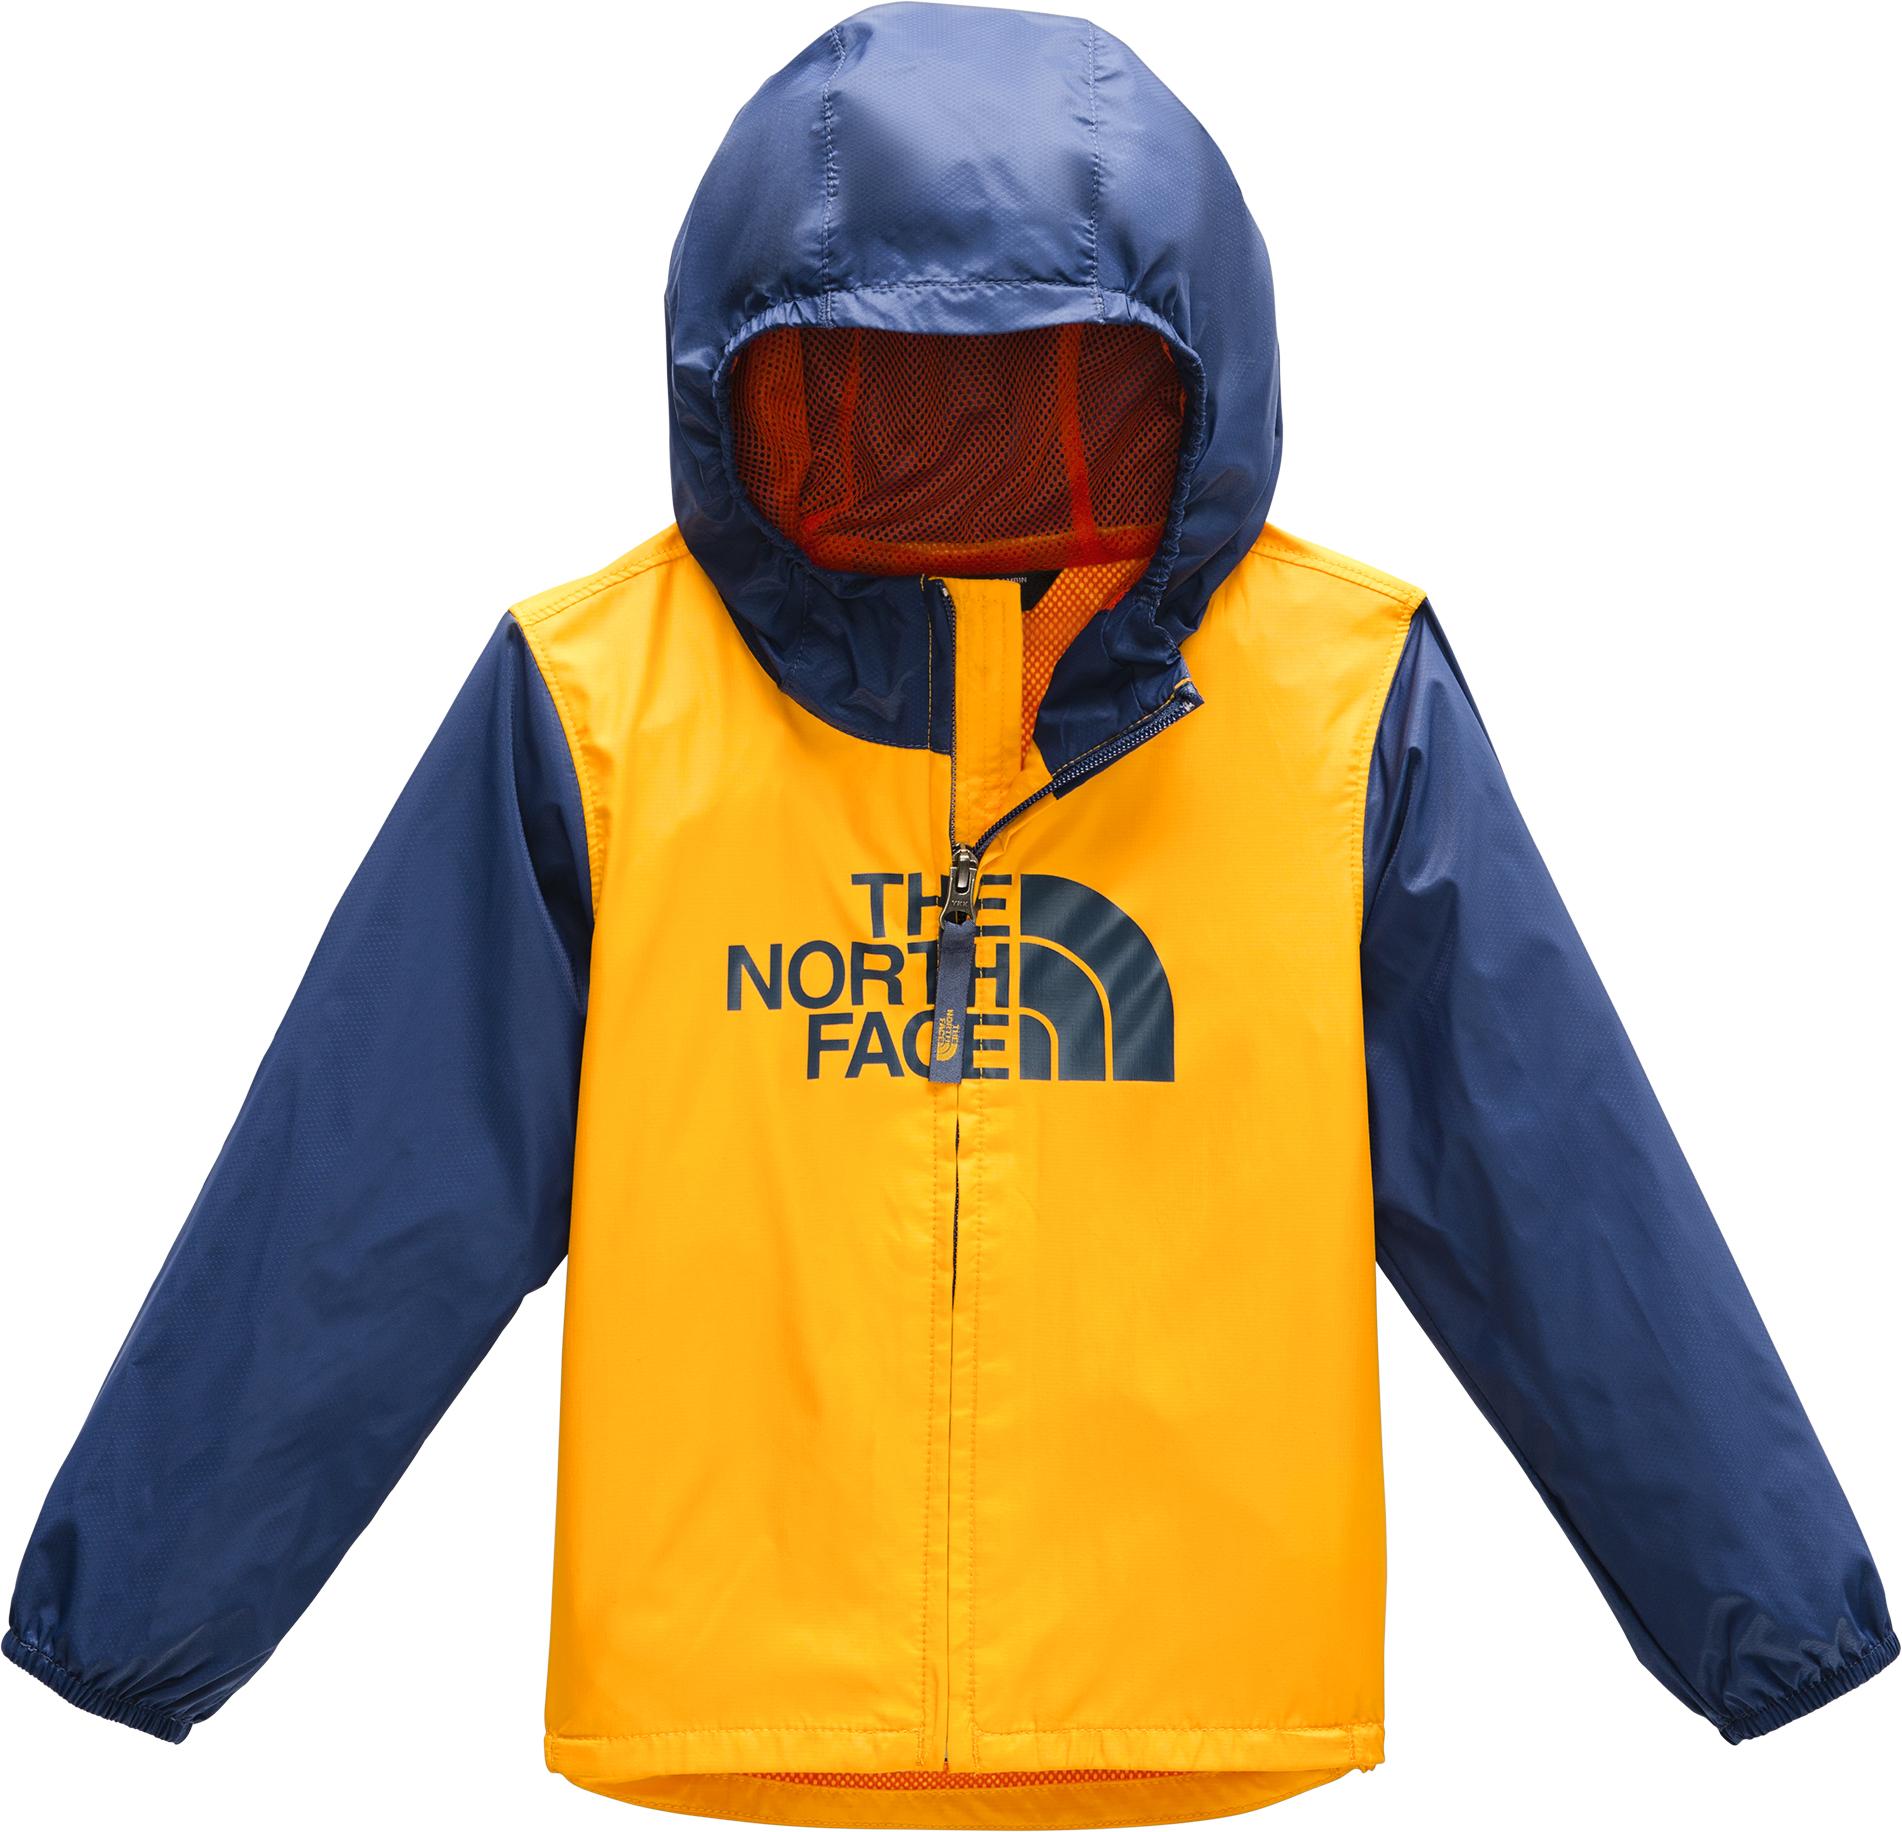 9379056e5 Rain jackets